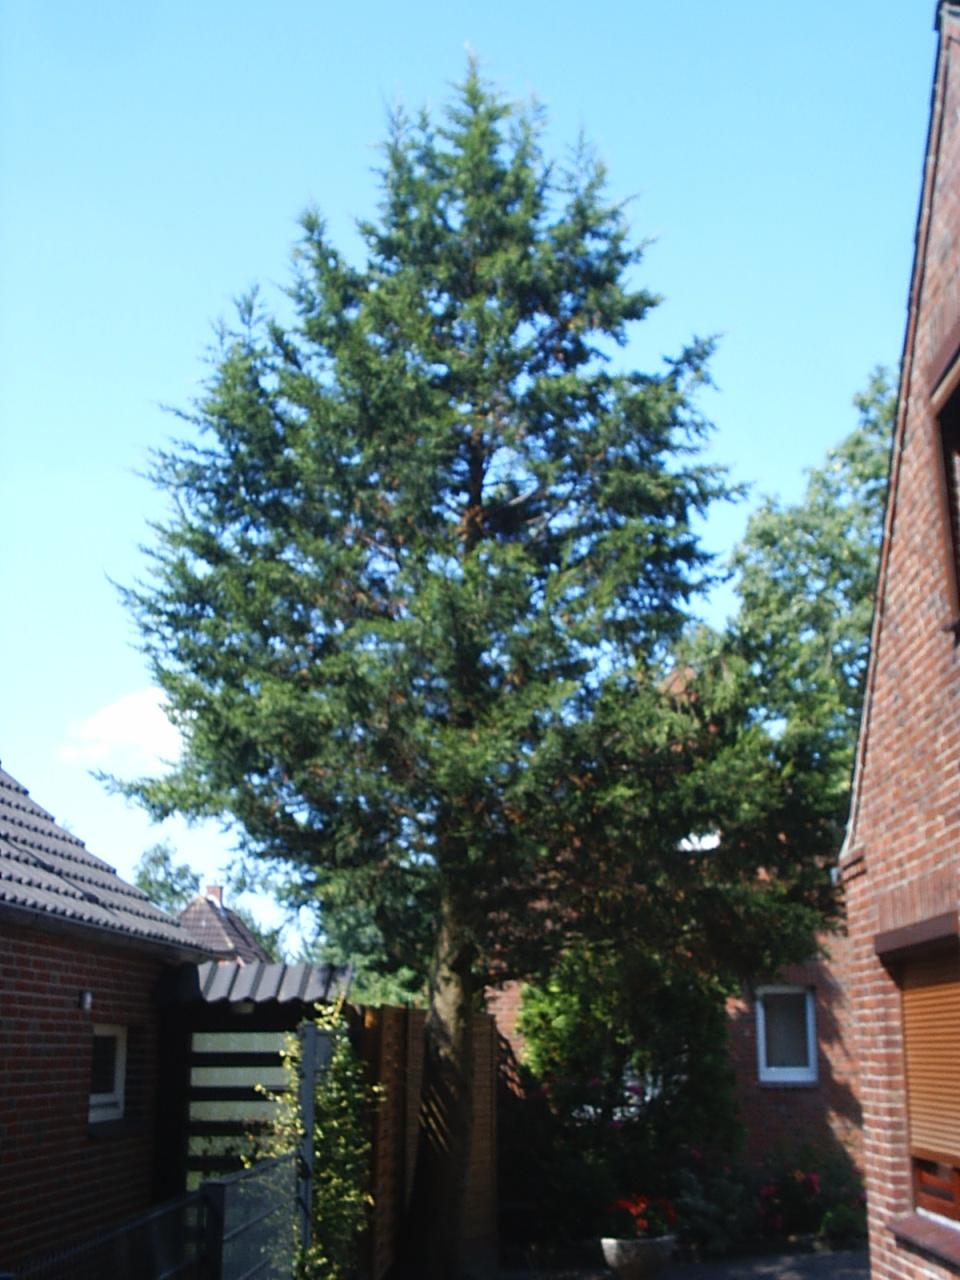 Sawara-Scheinzypresse (Chamaecyparis pisifera) - Habitus I.jpg